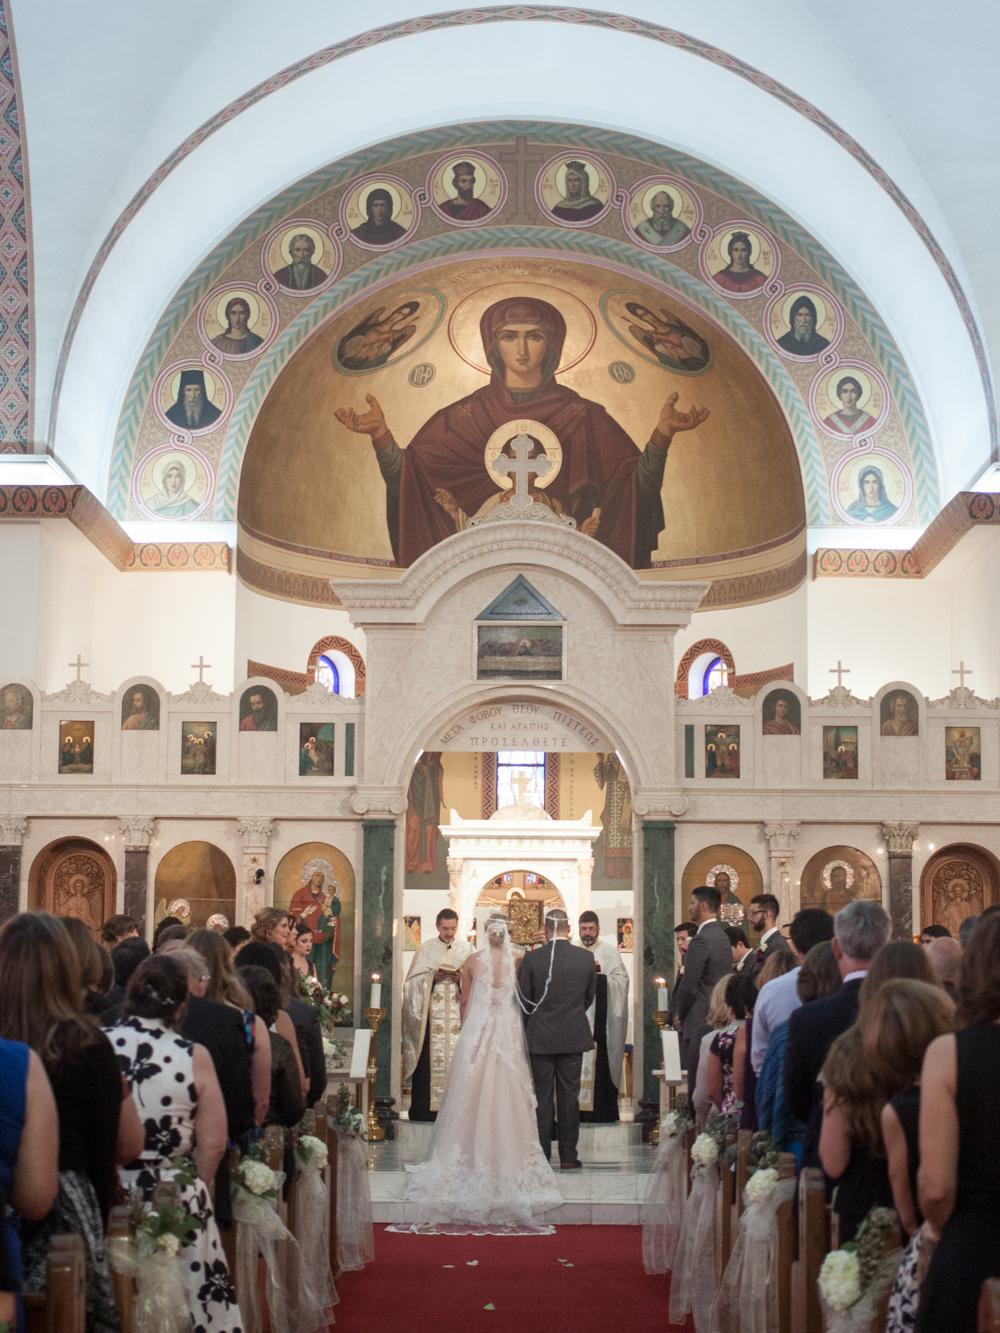 Houston wedding photographer - Christine Gosch - Houston film photographer - greek wedding in Houston - Annunciation Greek Orthodox church in Houston, Texas - Houston wedding planner -28.jpg